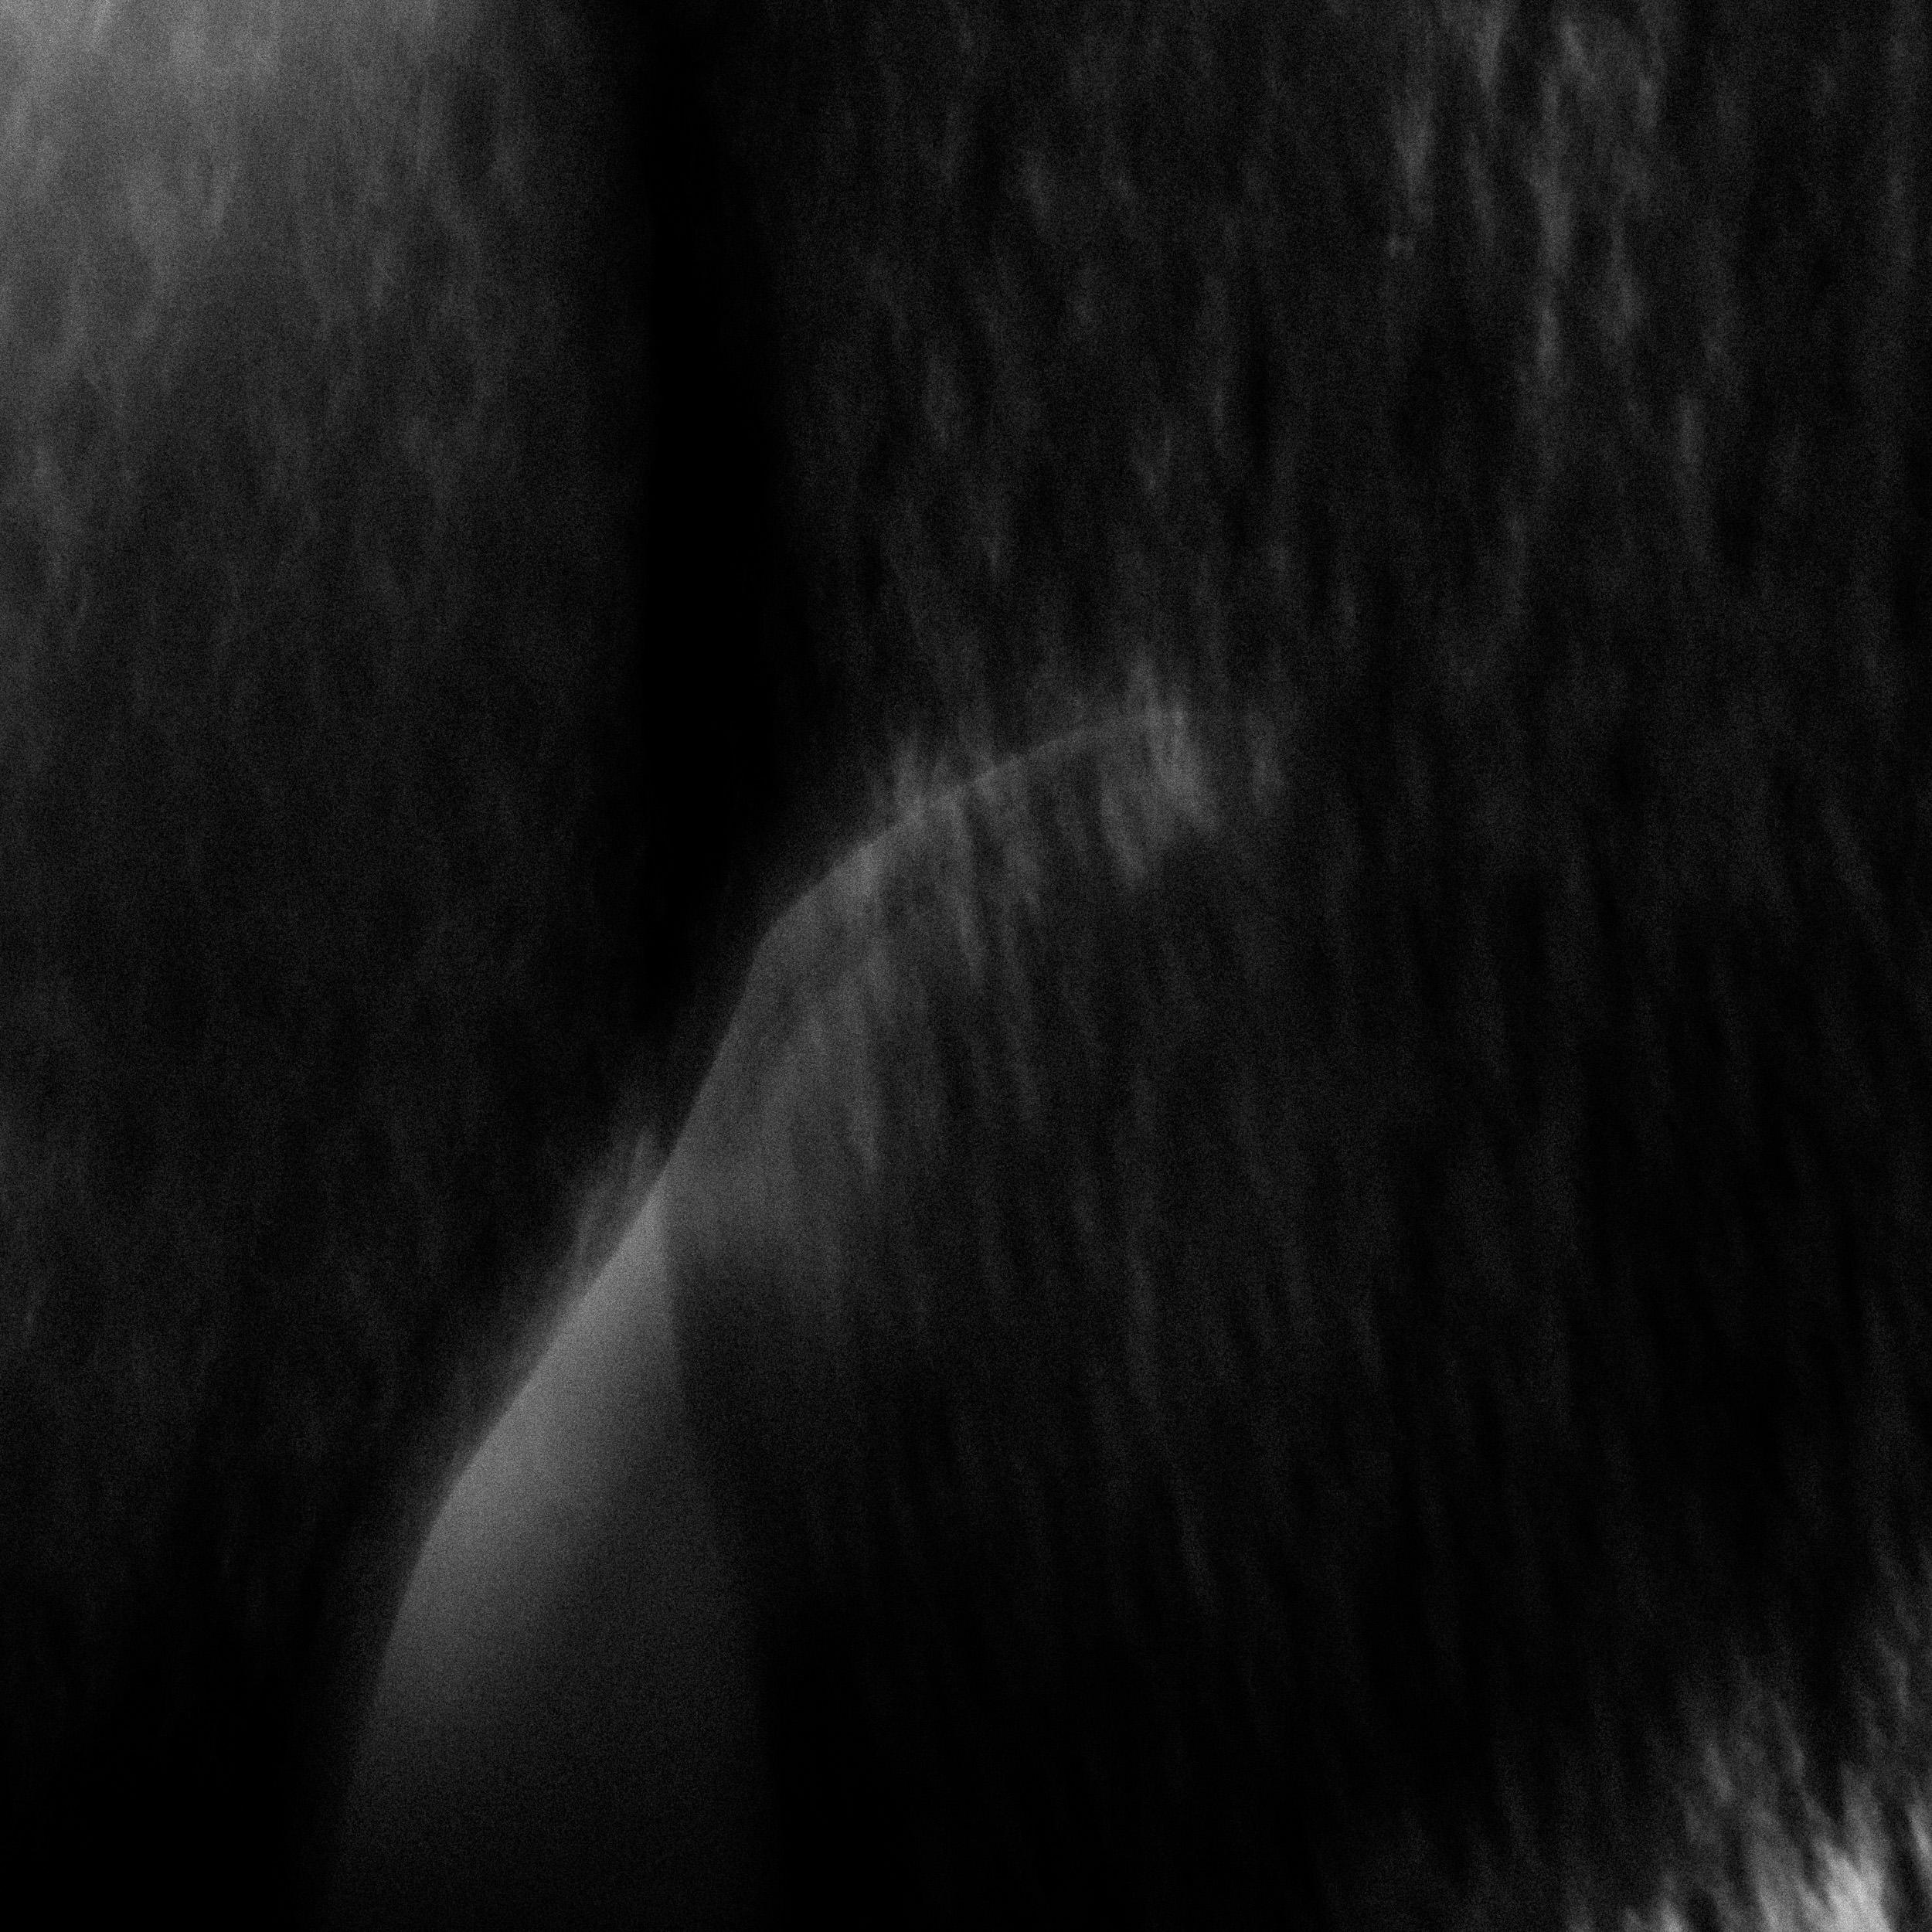 Frode_Olsen_Fine_art_photography_The_Rorschach_Exposures_13.jpg